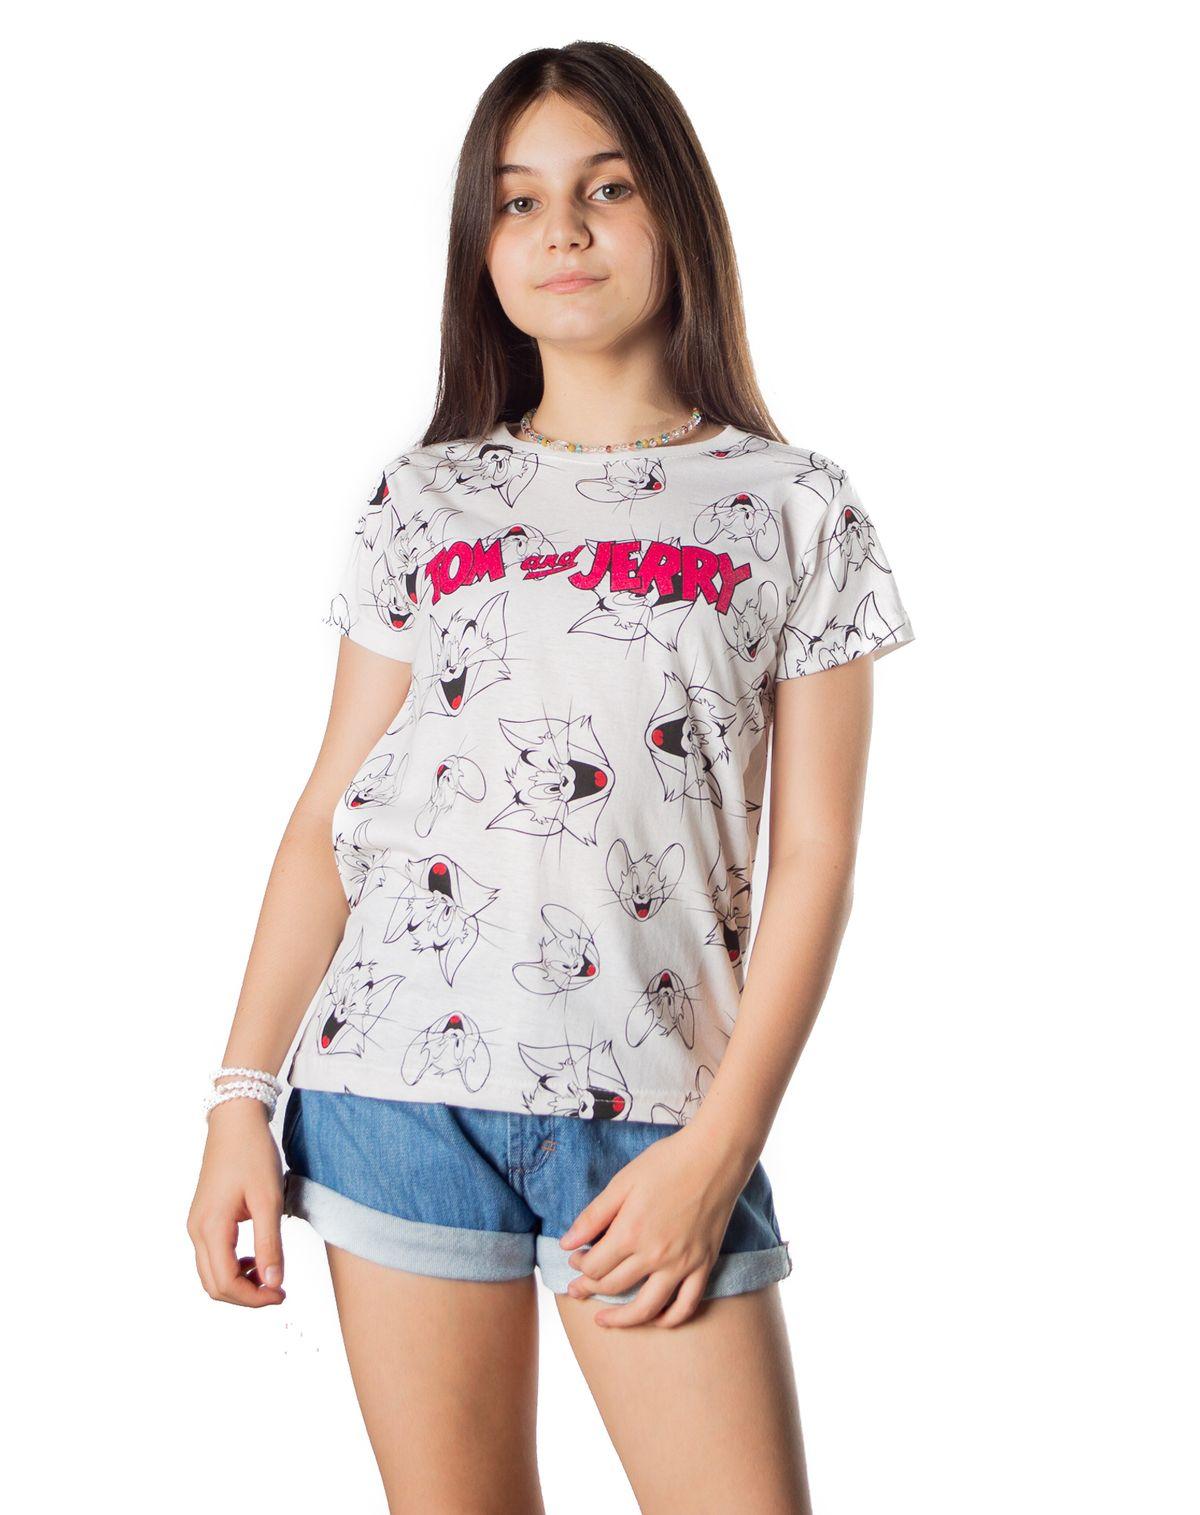 576565002-camiseta-juvenil-menina-estampa-tom-and-jerry-off-white-12-d38